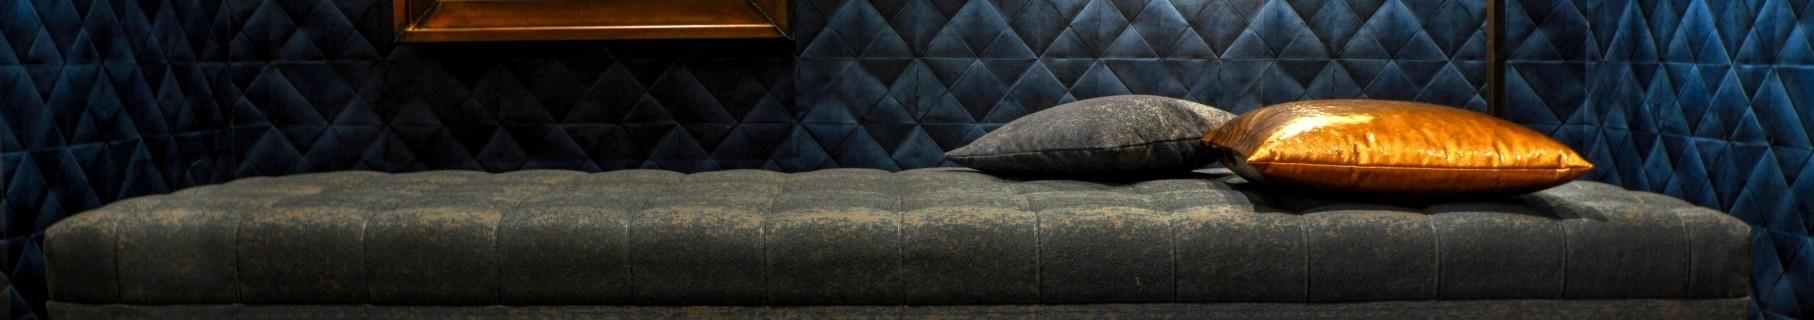 lounge-609383